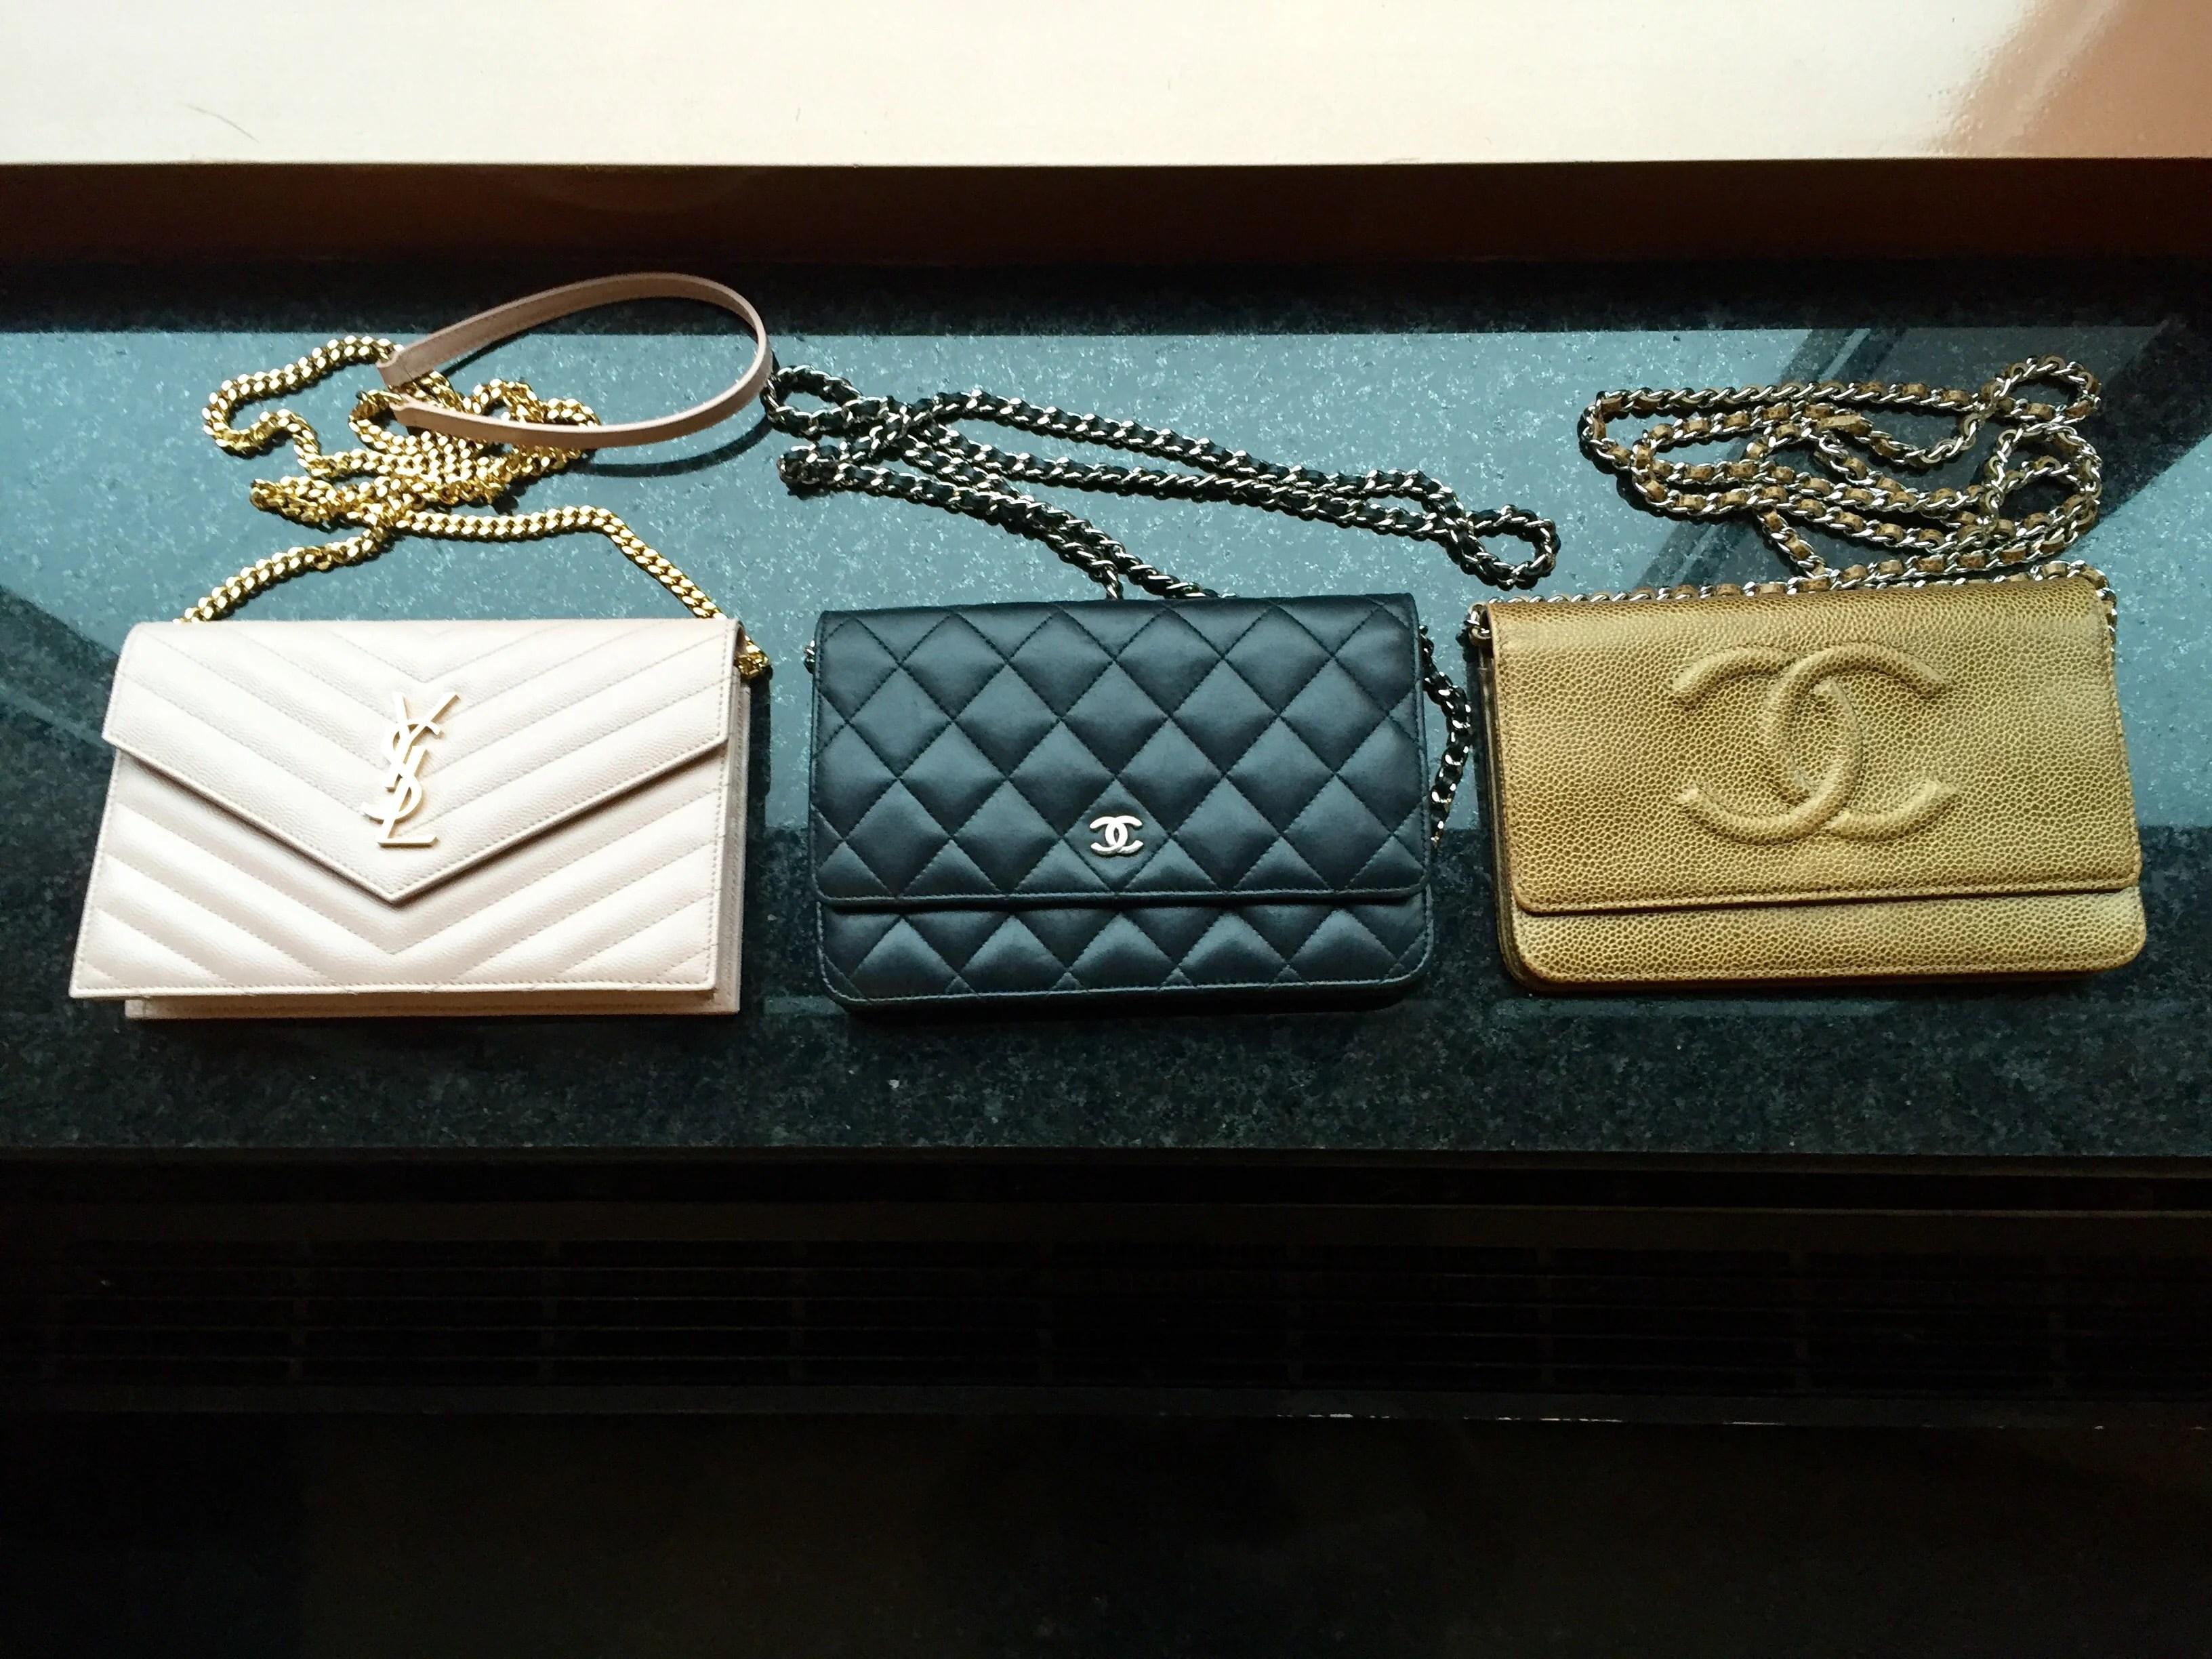 Chanel Vs Ysl Wallet On Chain Comparison Woc Pursebop